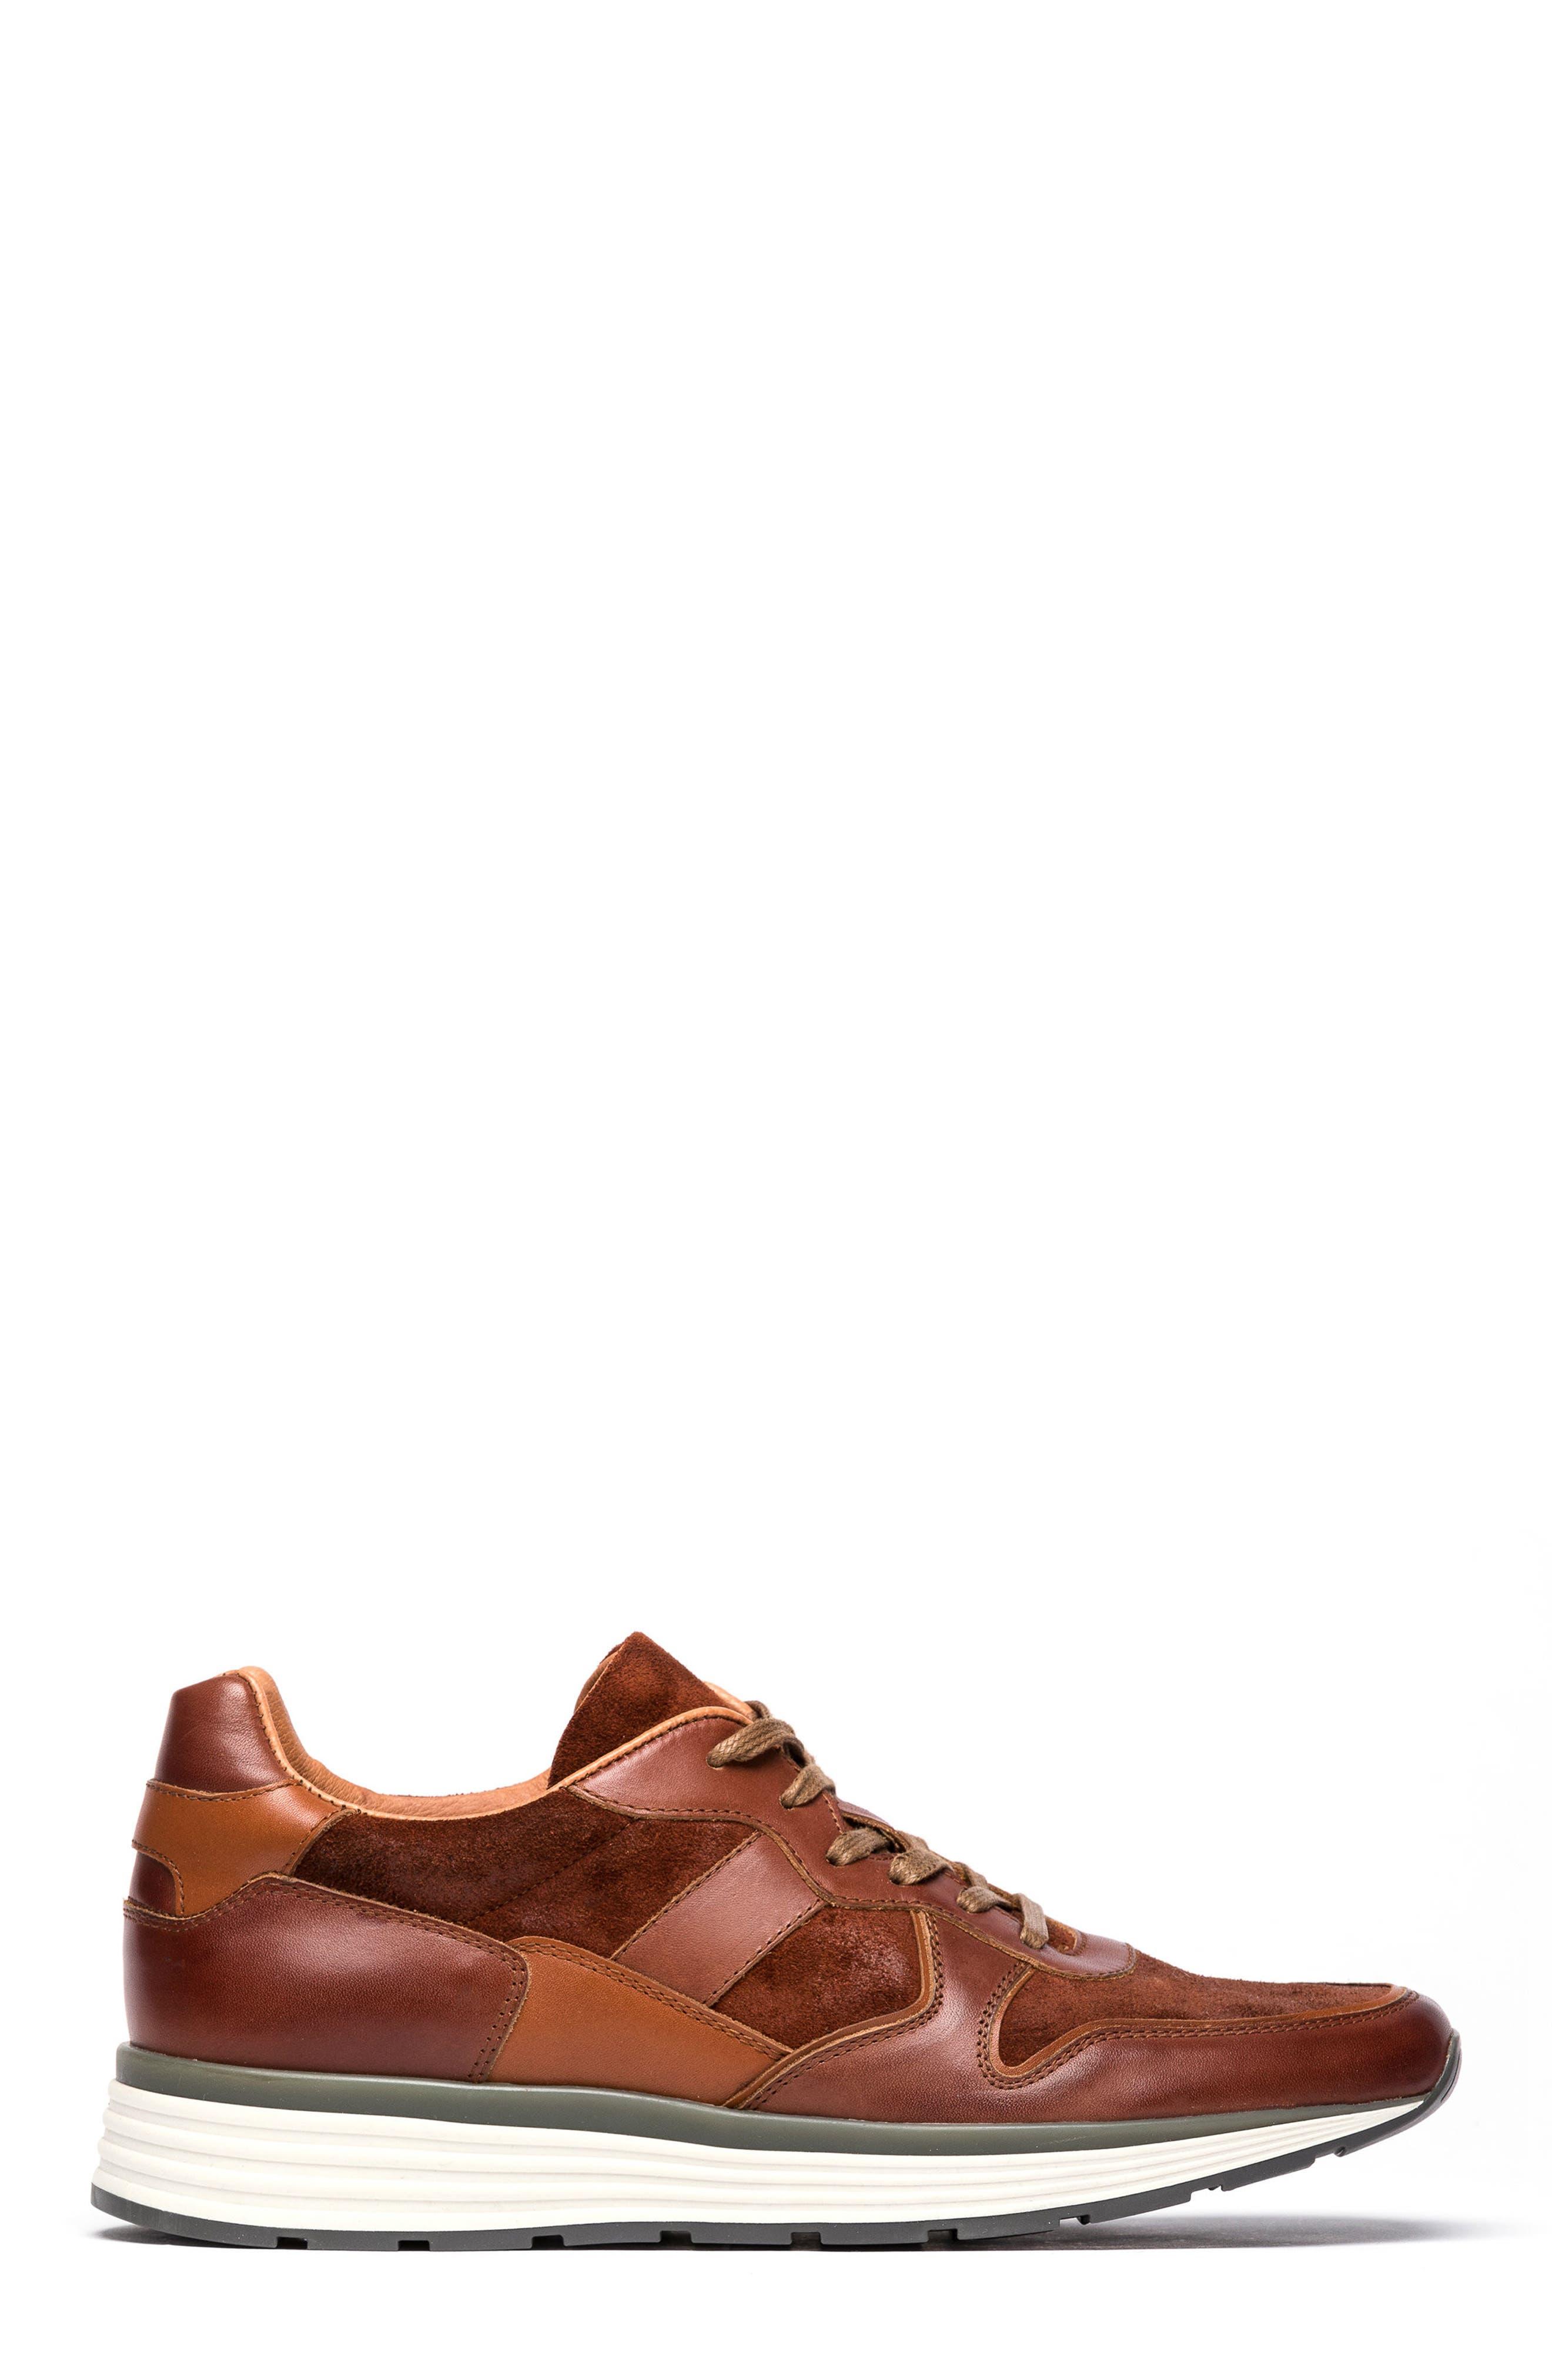 Hickory Sneaker,                             Alternate thumbnail 3, color,                             208